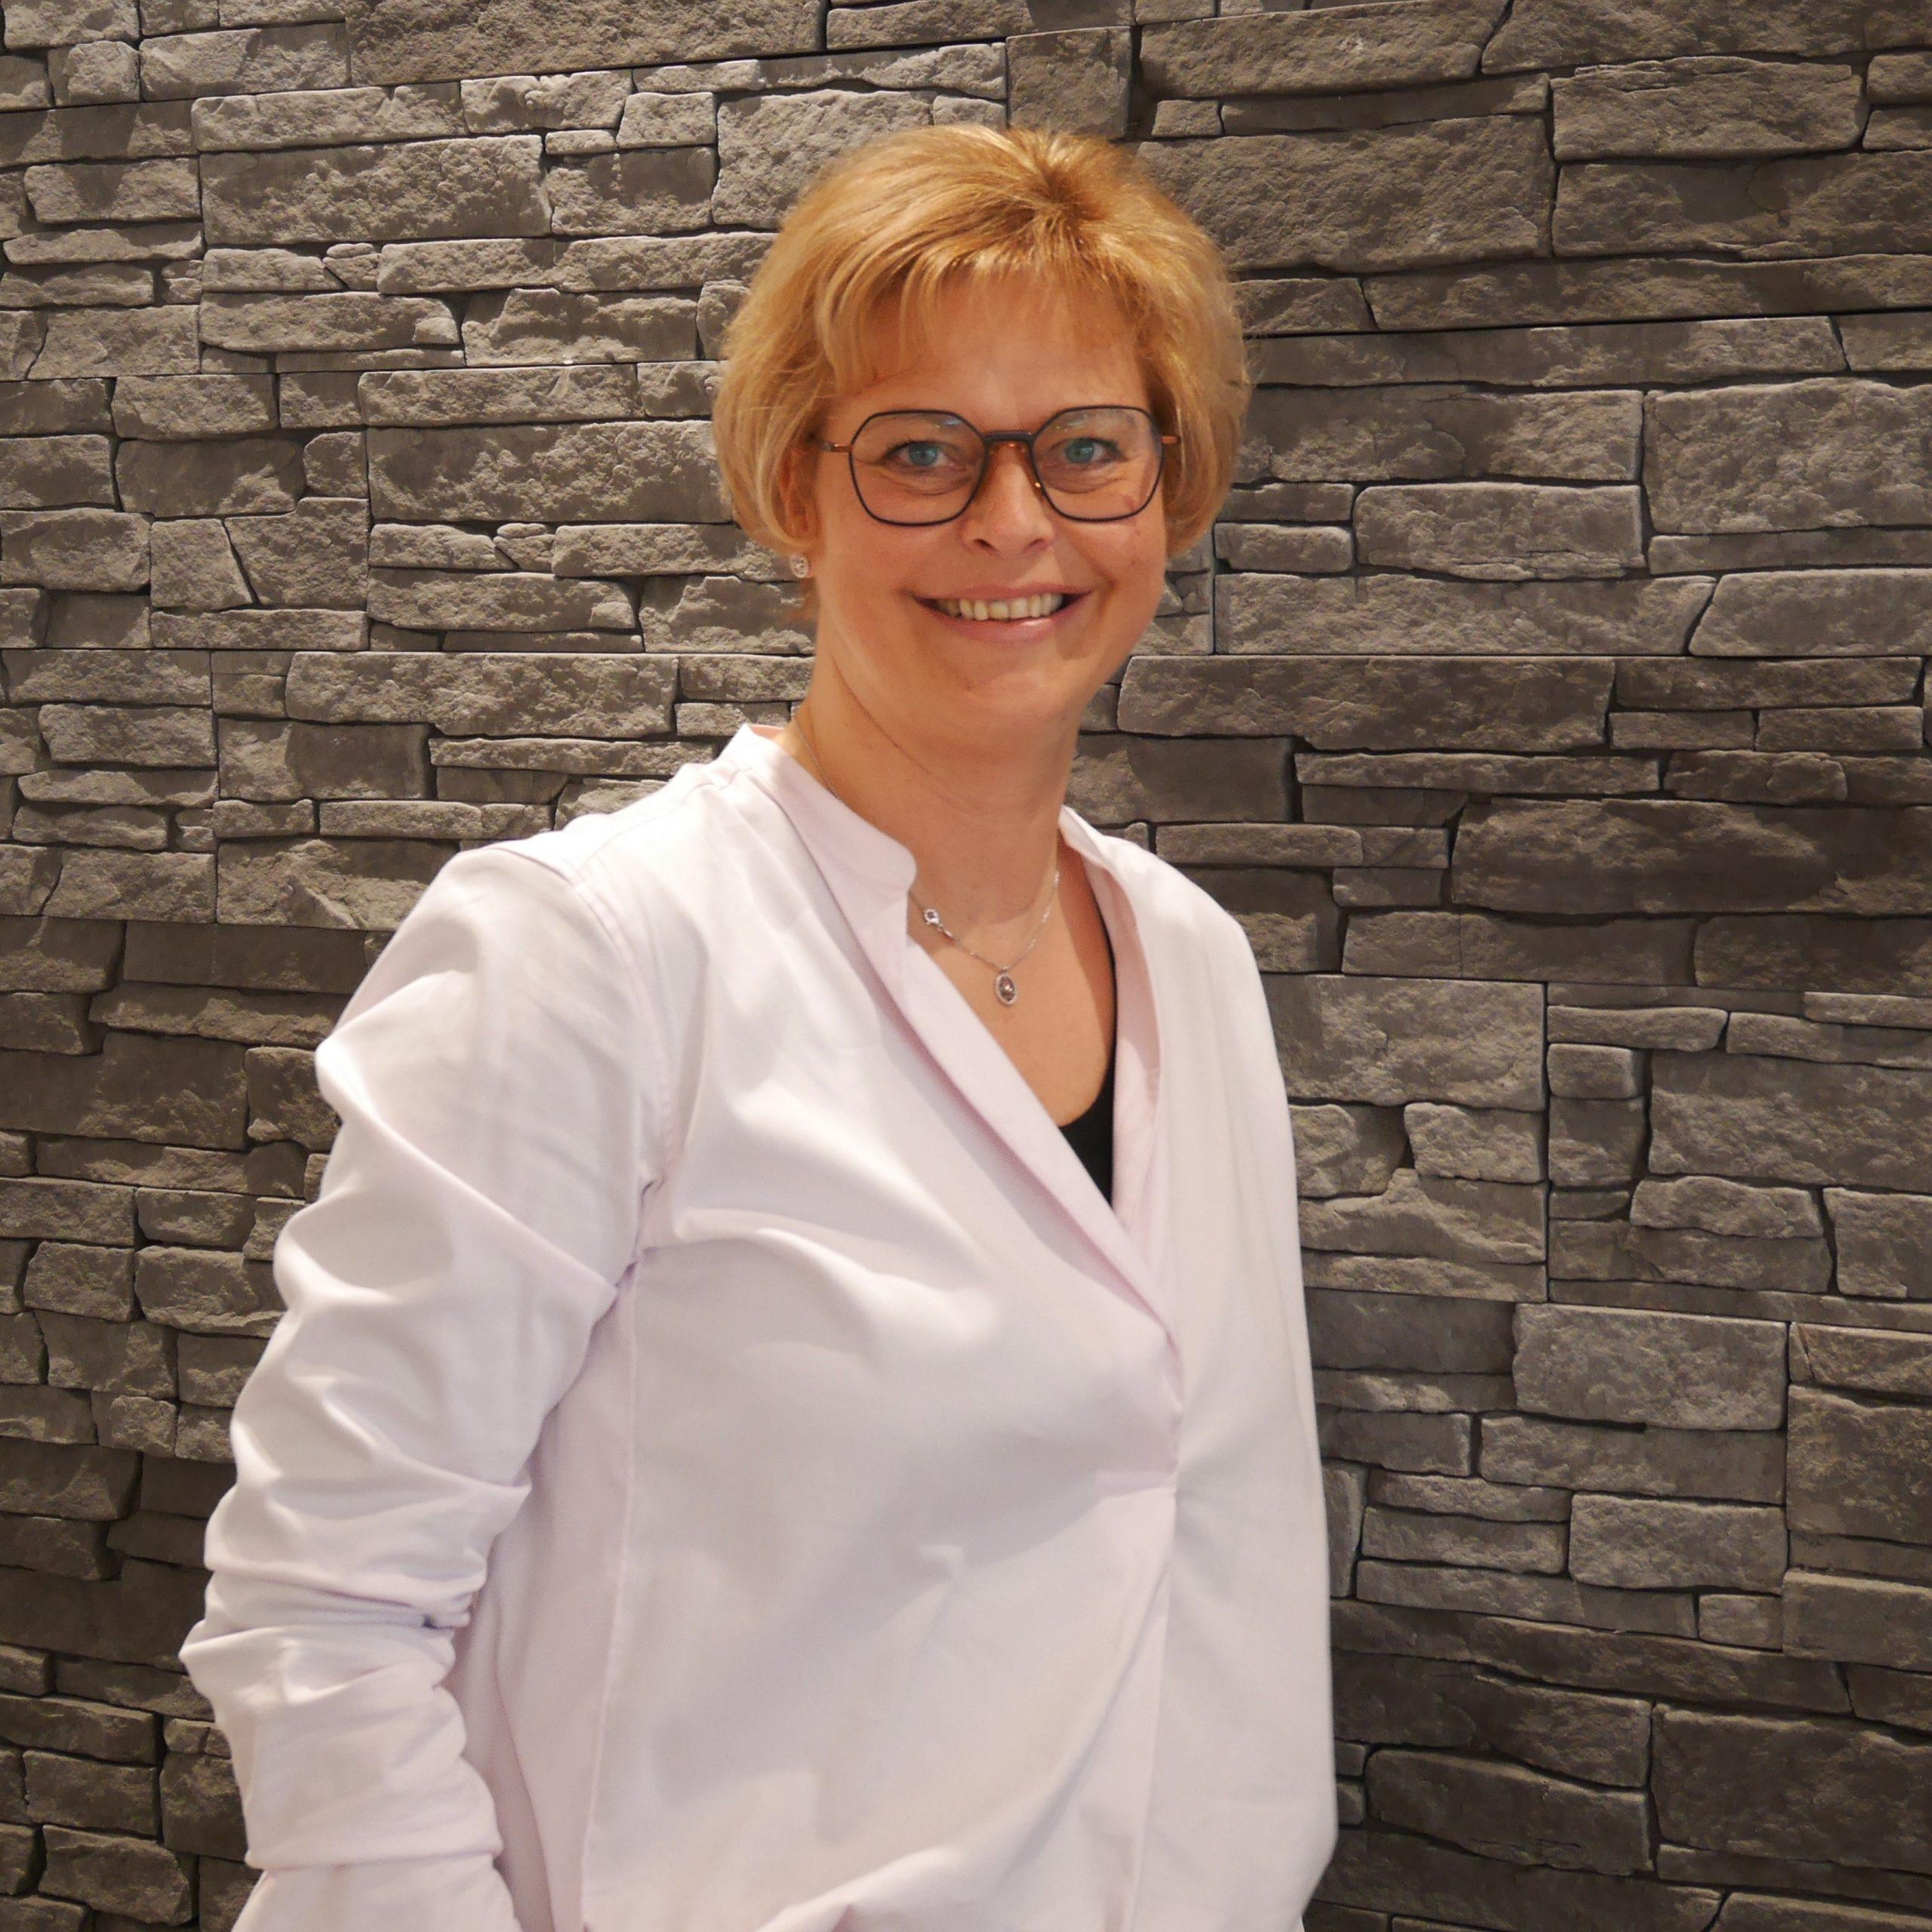 Claudia Drexler staatlich geprüfte Augenoptikermeisterin